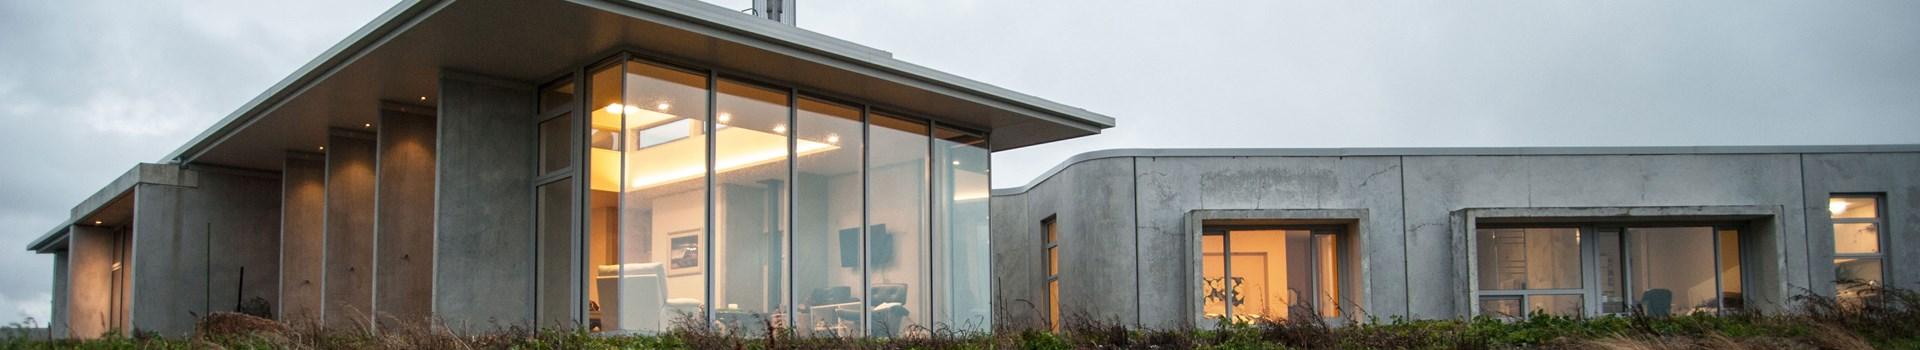 Pbs windows for Window manufacturers nz